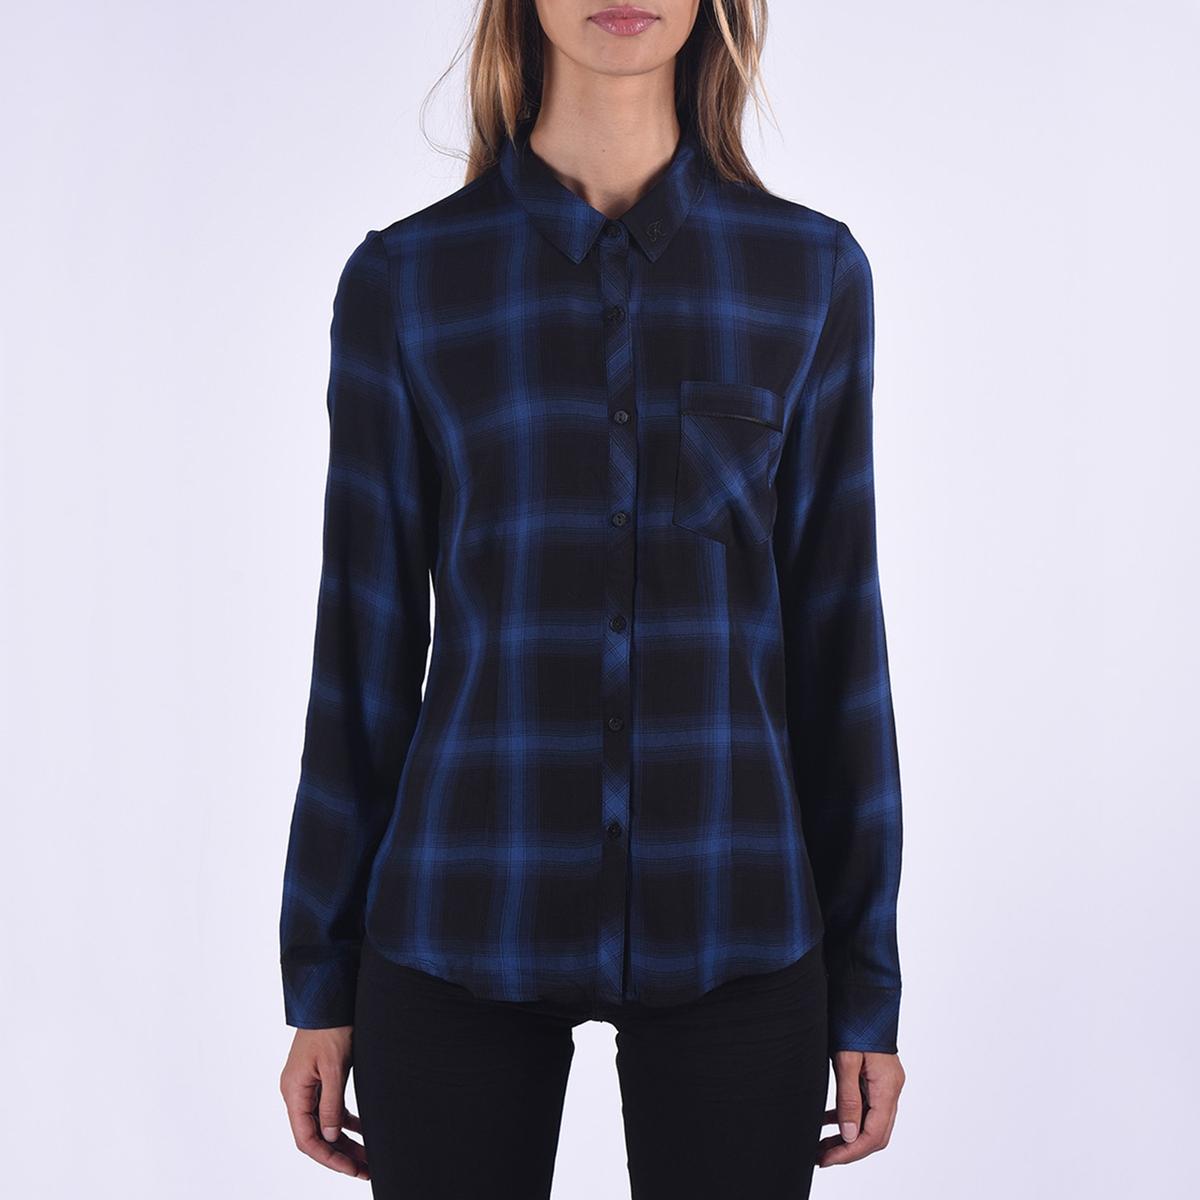 Блузка в клетку с длинными рукавами блузка в клетку с воланами и длинными рукавами check